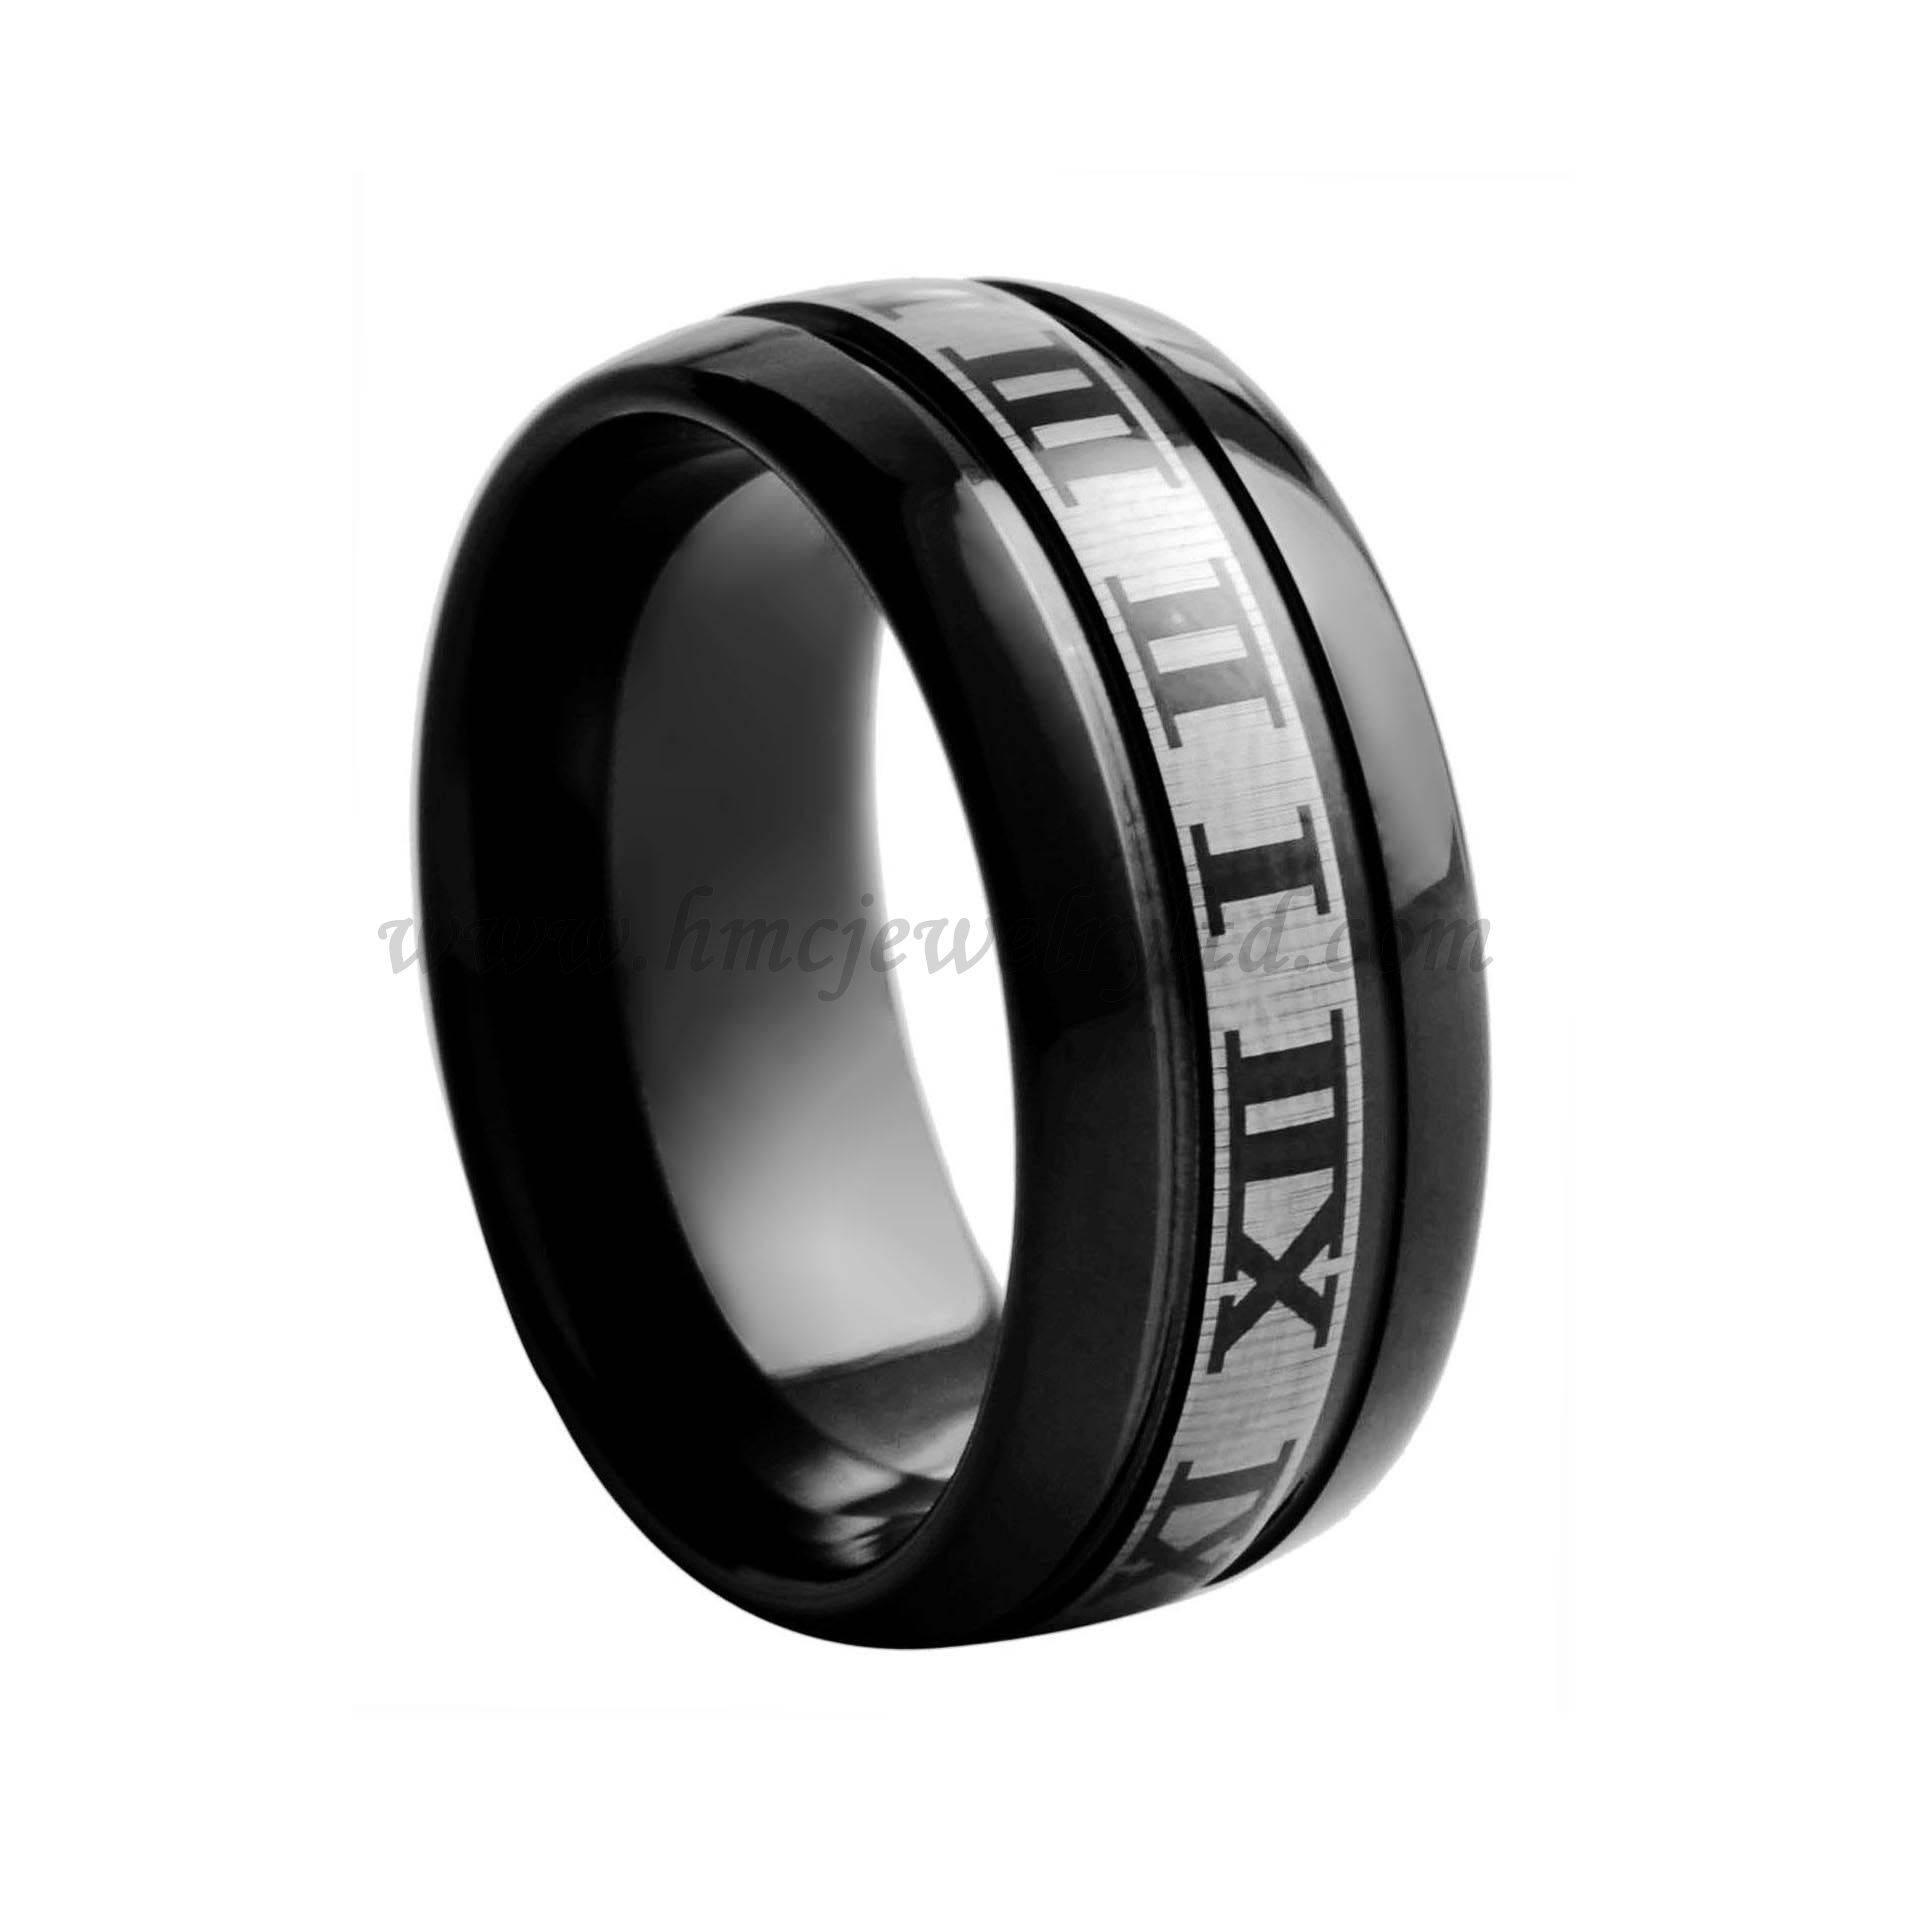 Laser Roman Numerals Mens Tungsten Rings Jewelry, Black Tungsten Carbide Ring